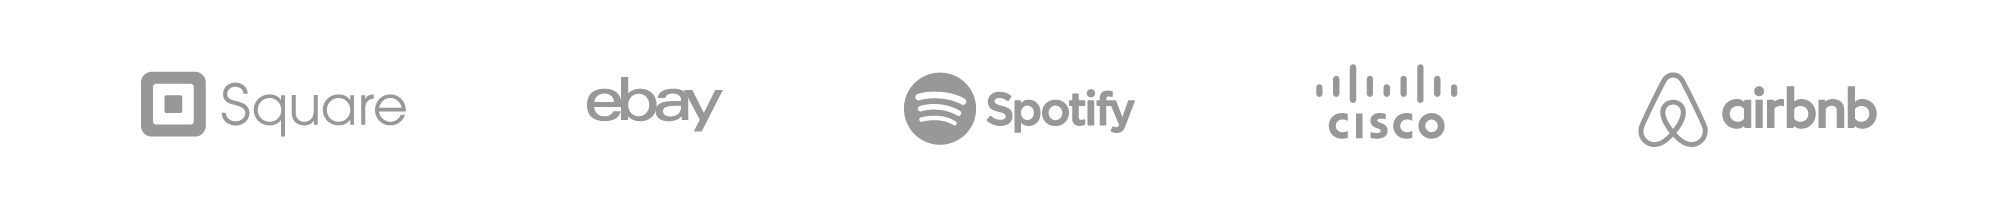 JIRA Customers: Square, eBay, Spotify, Cisco, and LinkedIn